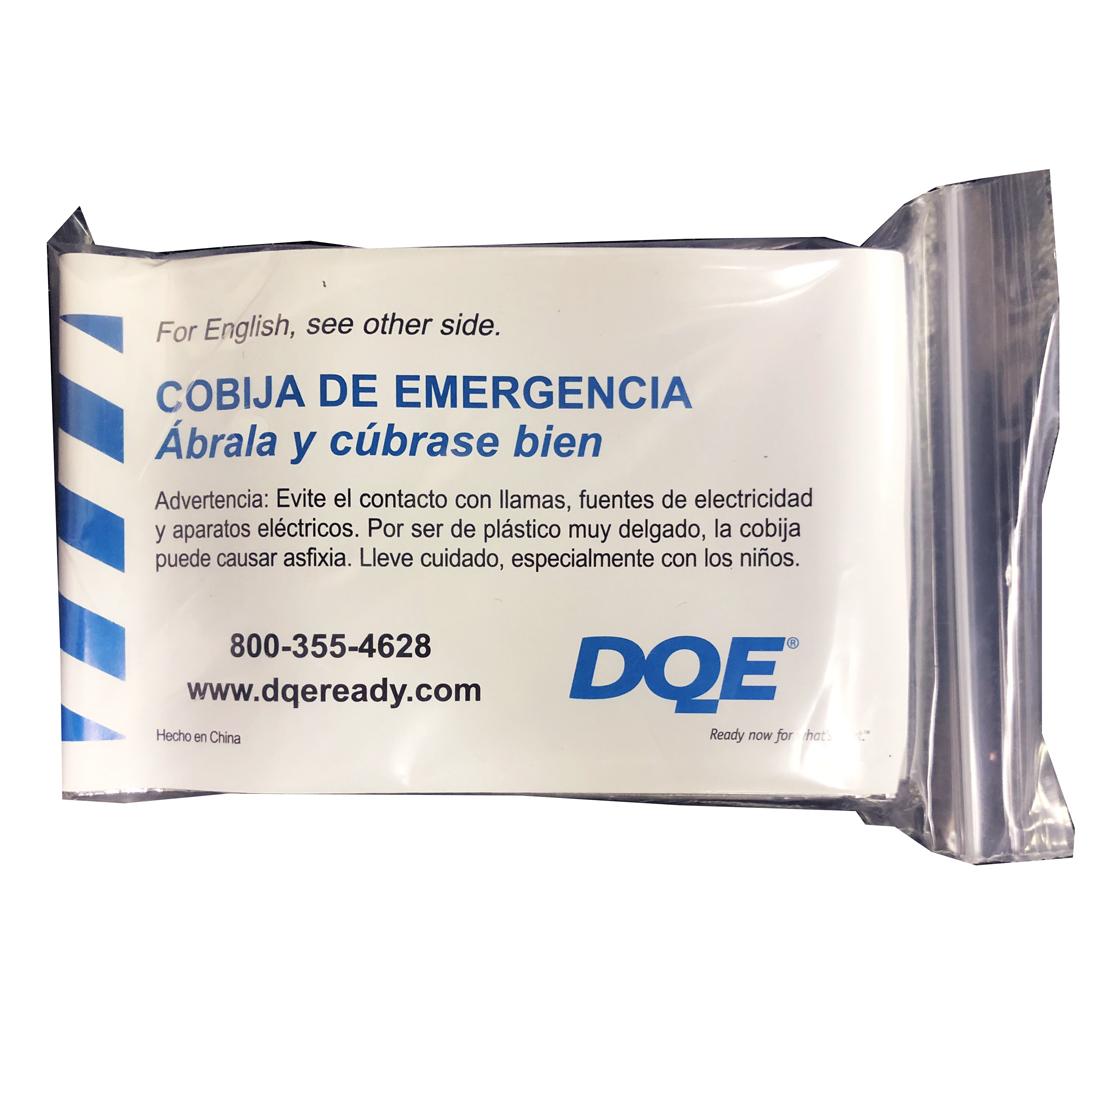 Emergency Warming Blanket Package Back Spanish image